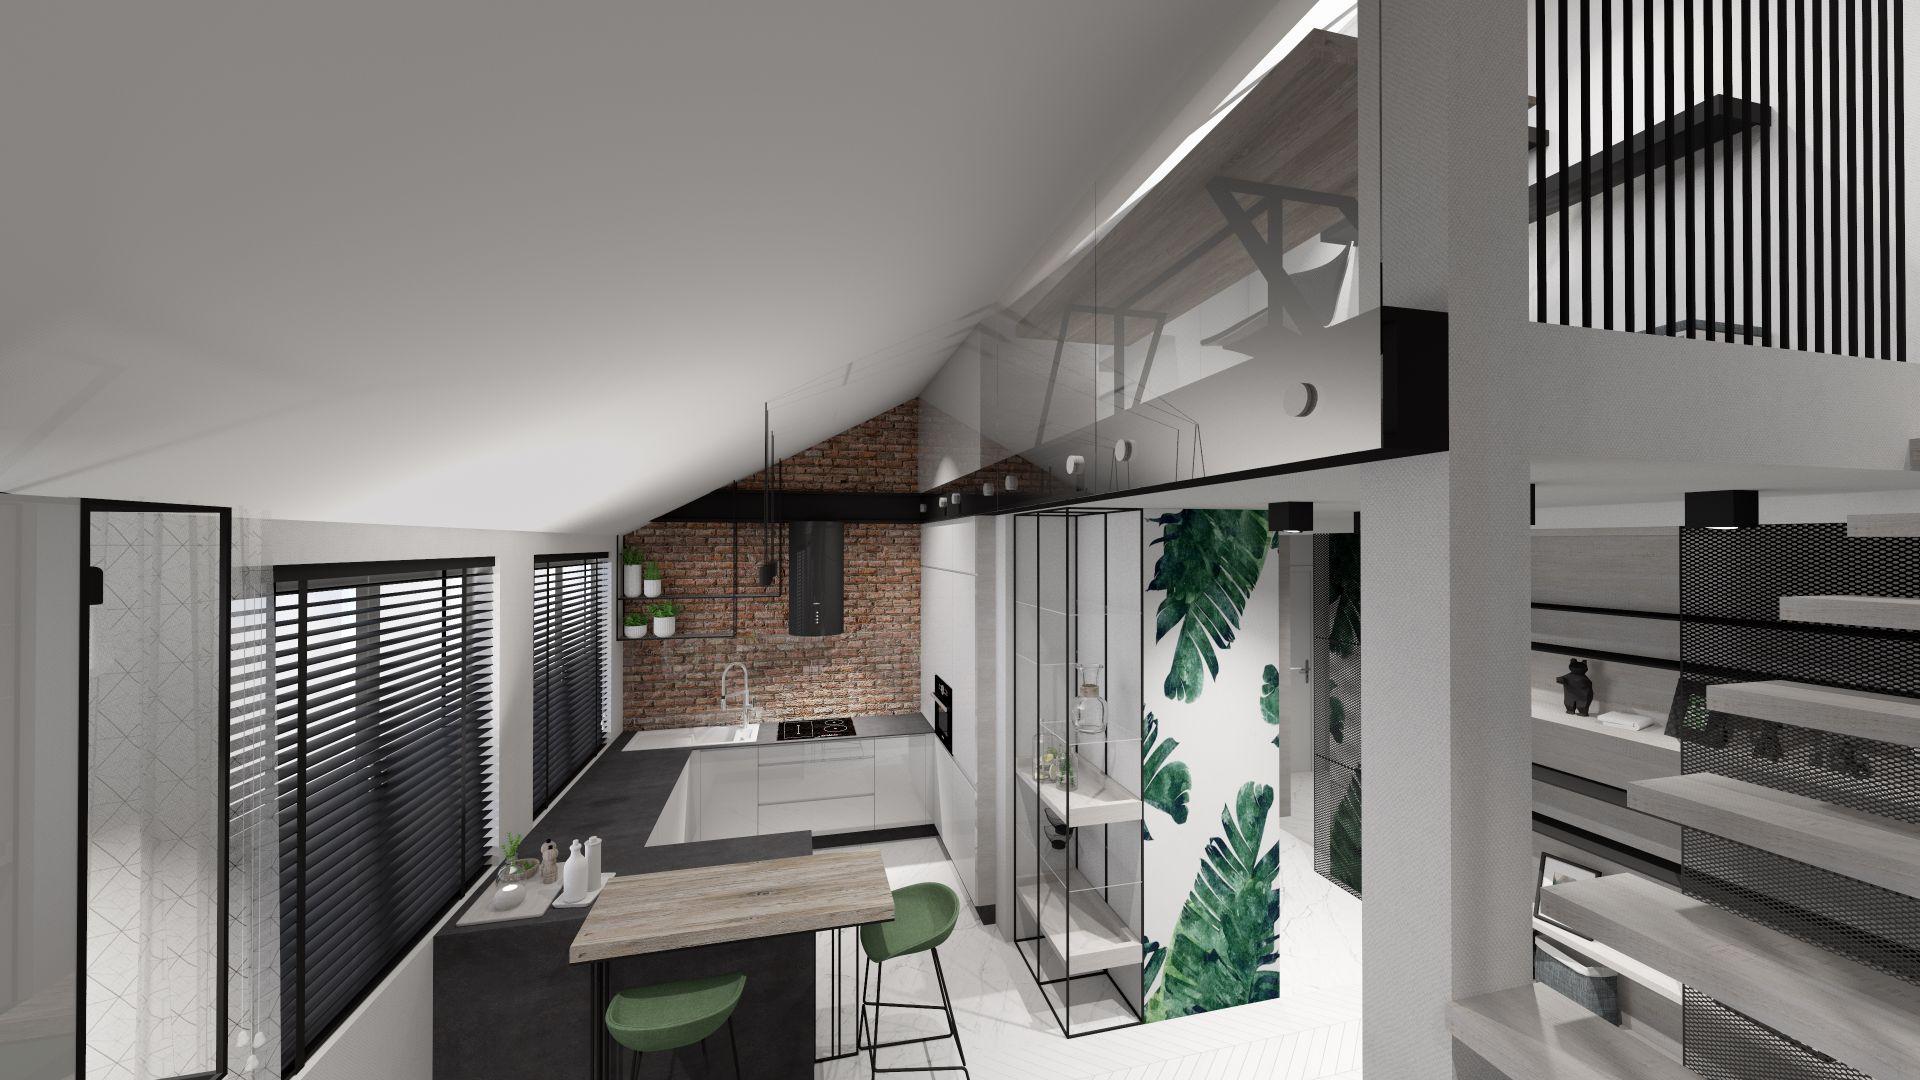 antresola_singiel_projektantpulawy-pulawy-interior-design-designer-industrial-steel-roof-antresola-brick 13